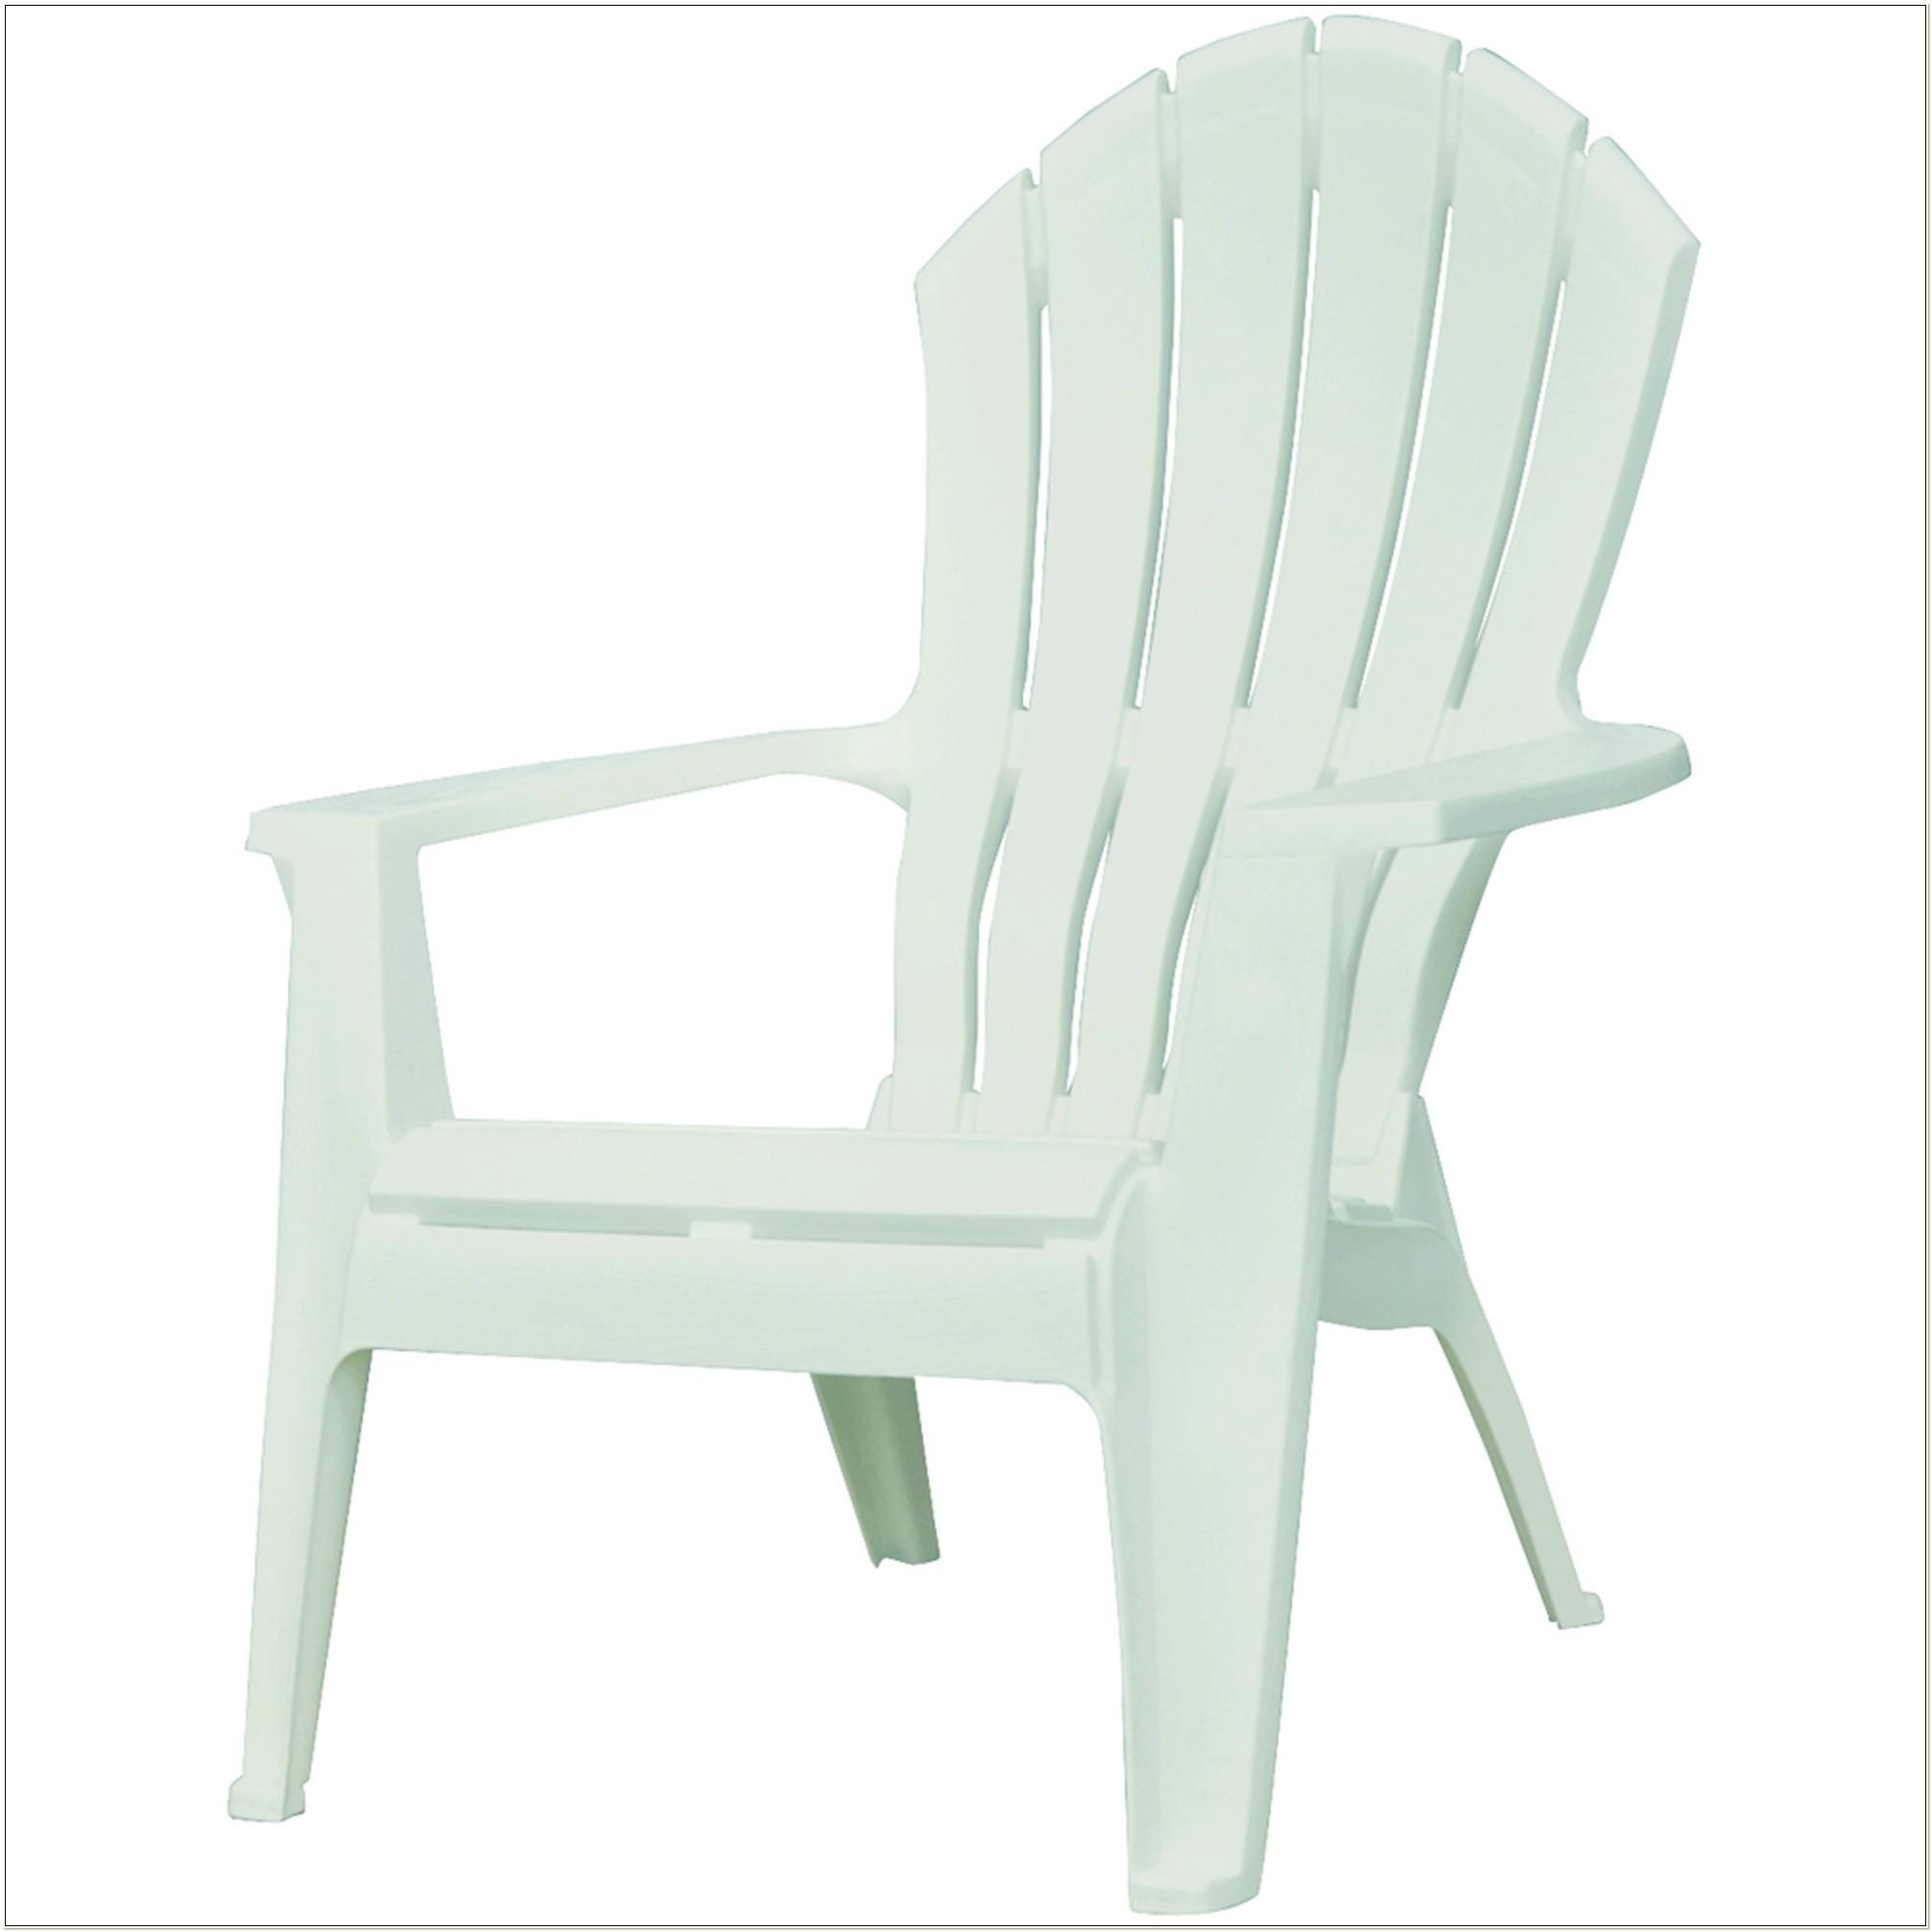 Real Comfort Adirondack Chairs Walmart